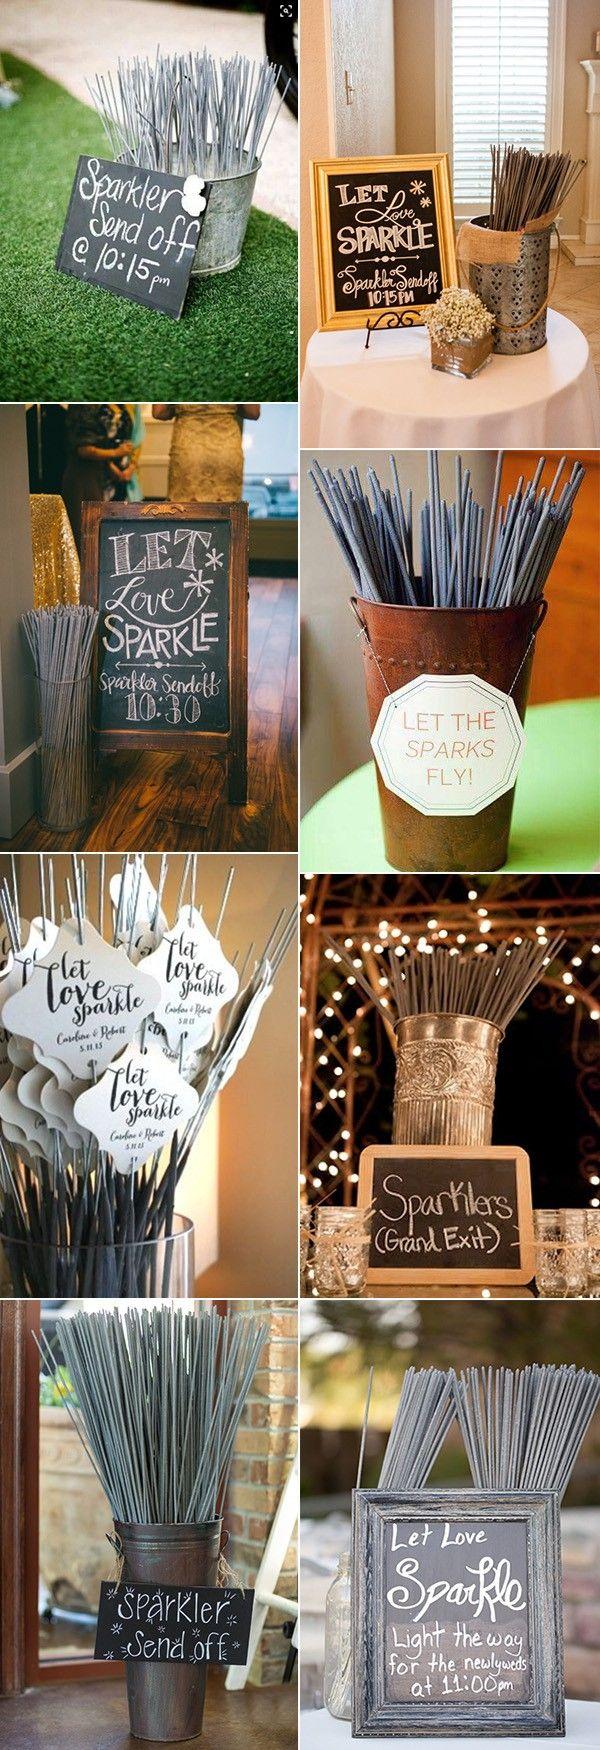 Best 25 handmade wedding decorations ideas on pinterest 70 amazing fall wedding ideas for 2017 junglespirit Image collections